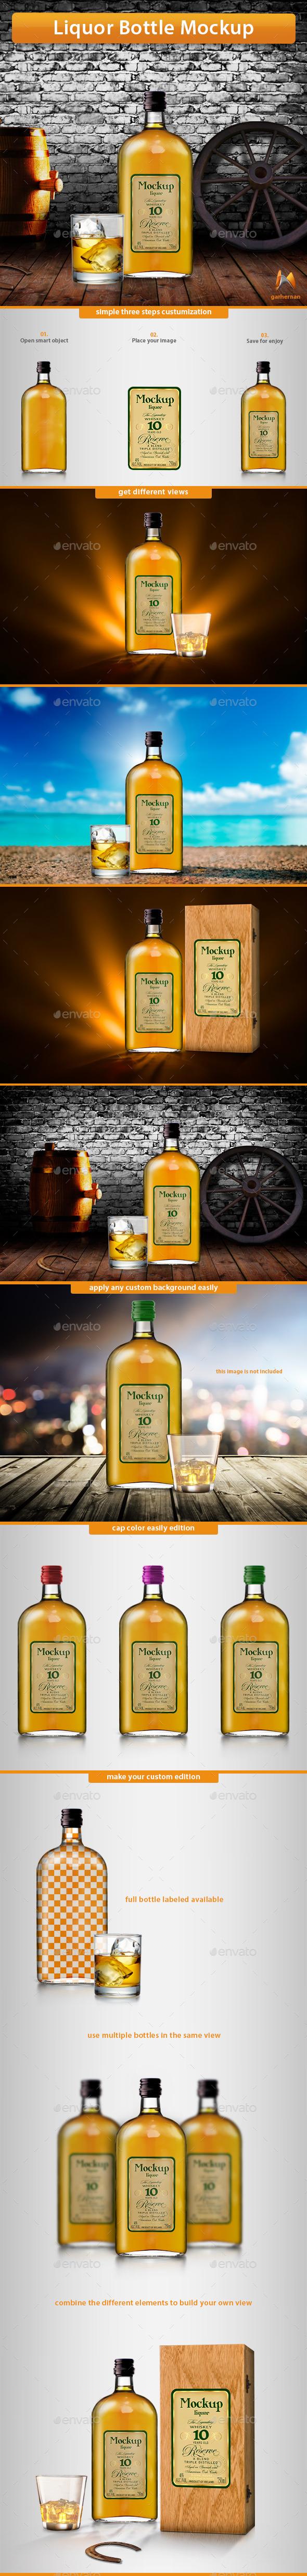 GraphicRiver Liquor Bottle Mockup 11094007